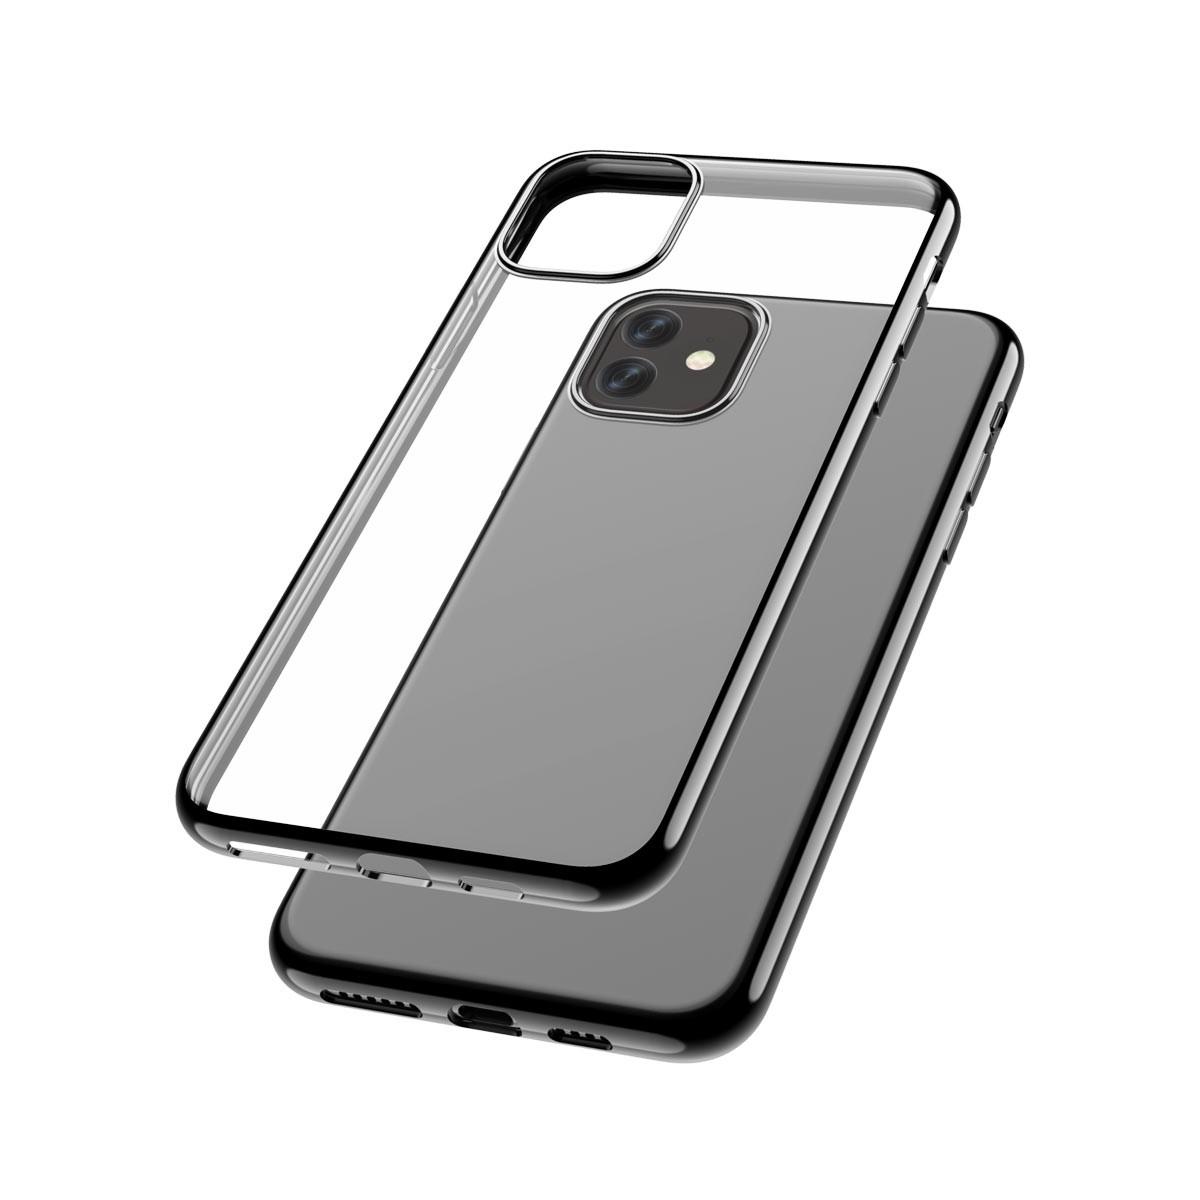 Capac protectie spate cellara colectia electro pentru iphone 11 - negru